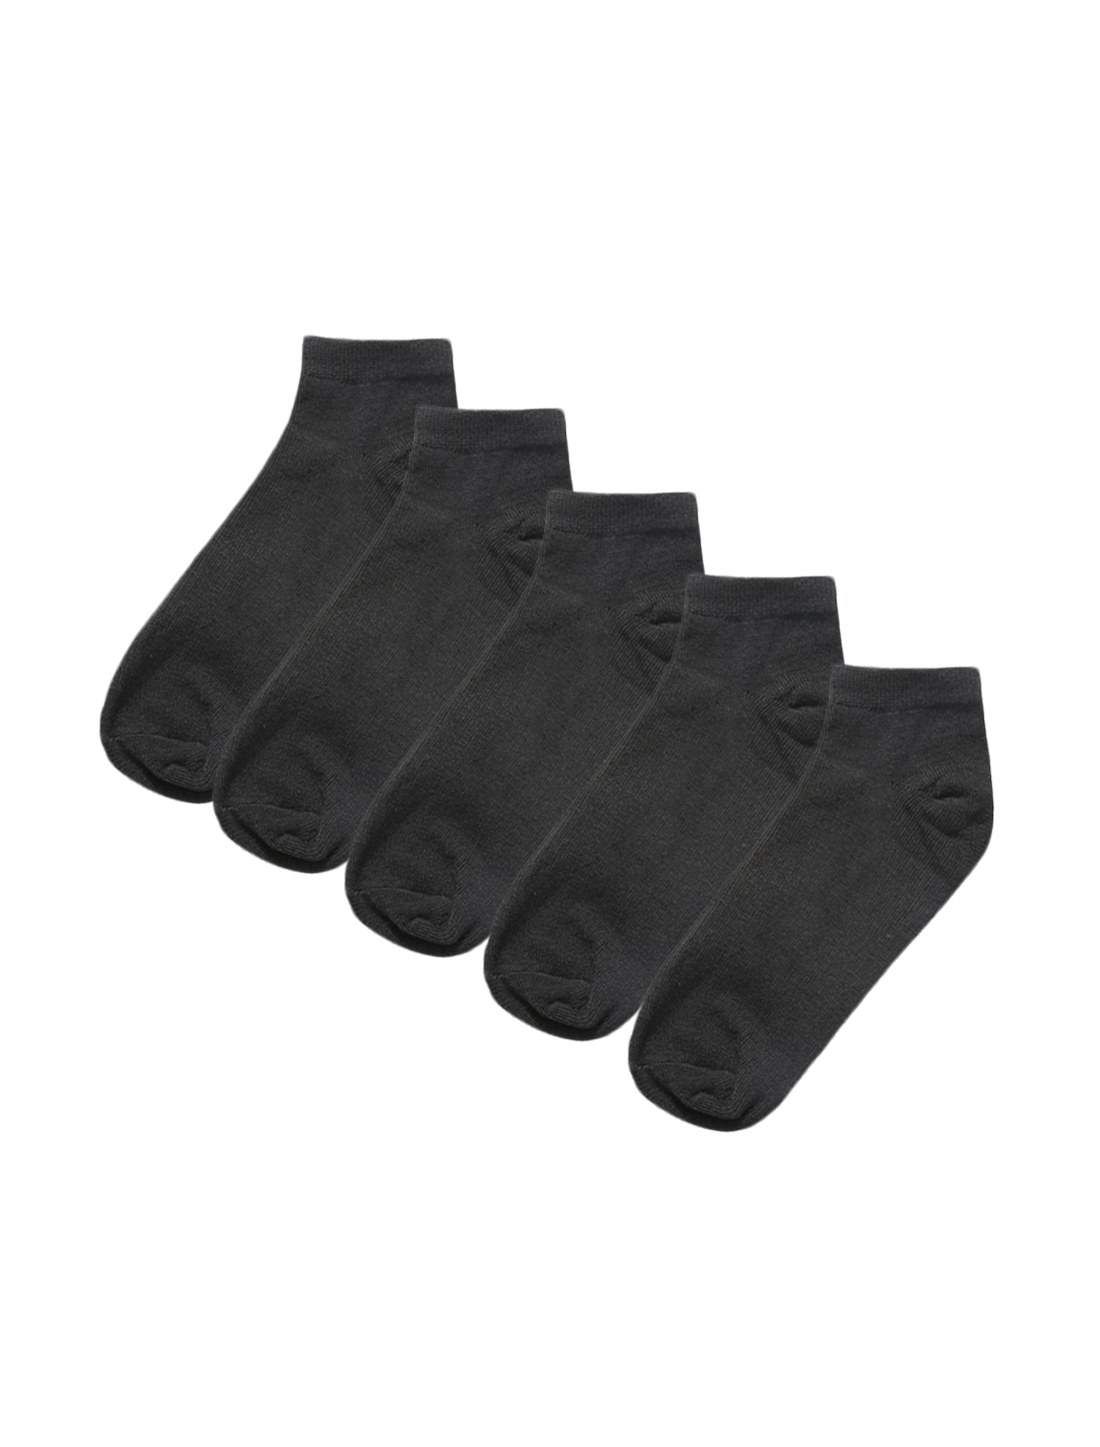 Athletic Low Cut Ankle Socks Elastic Cuff 5 Pairs Black XXS